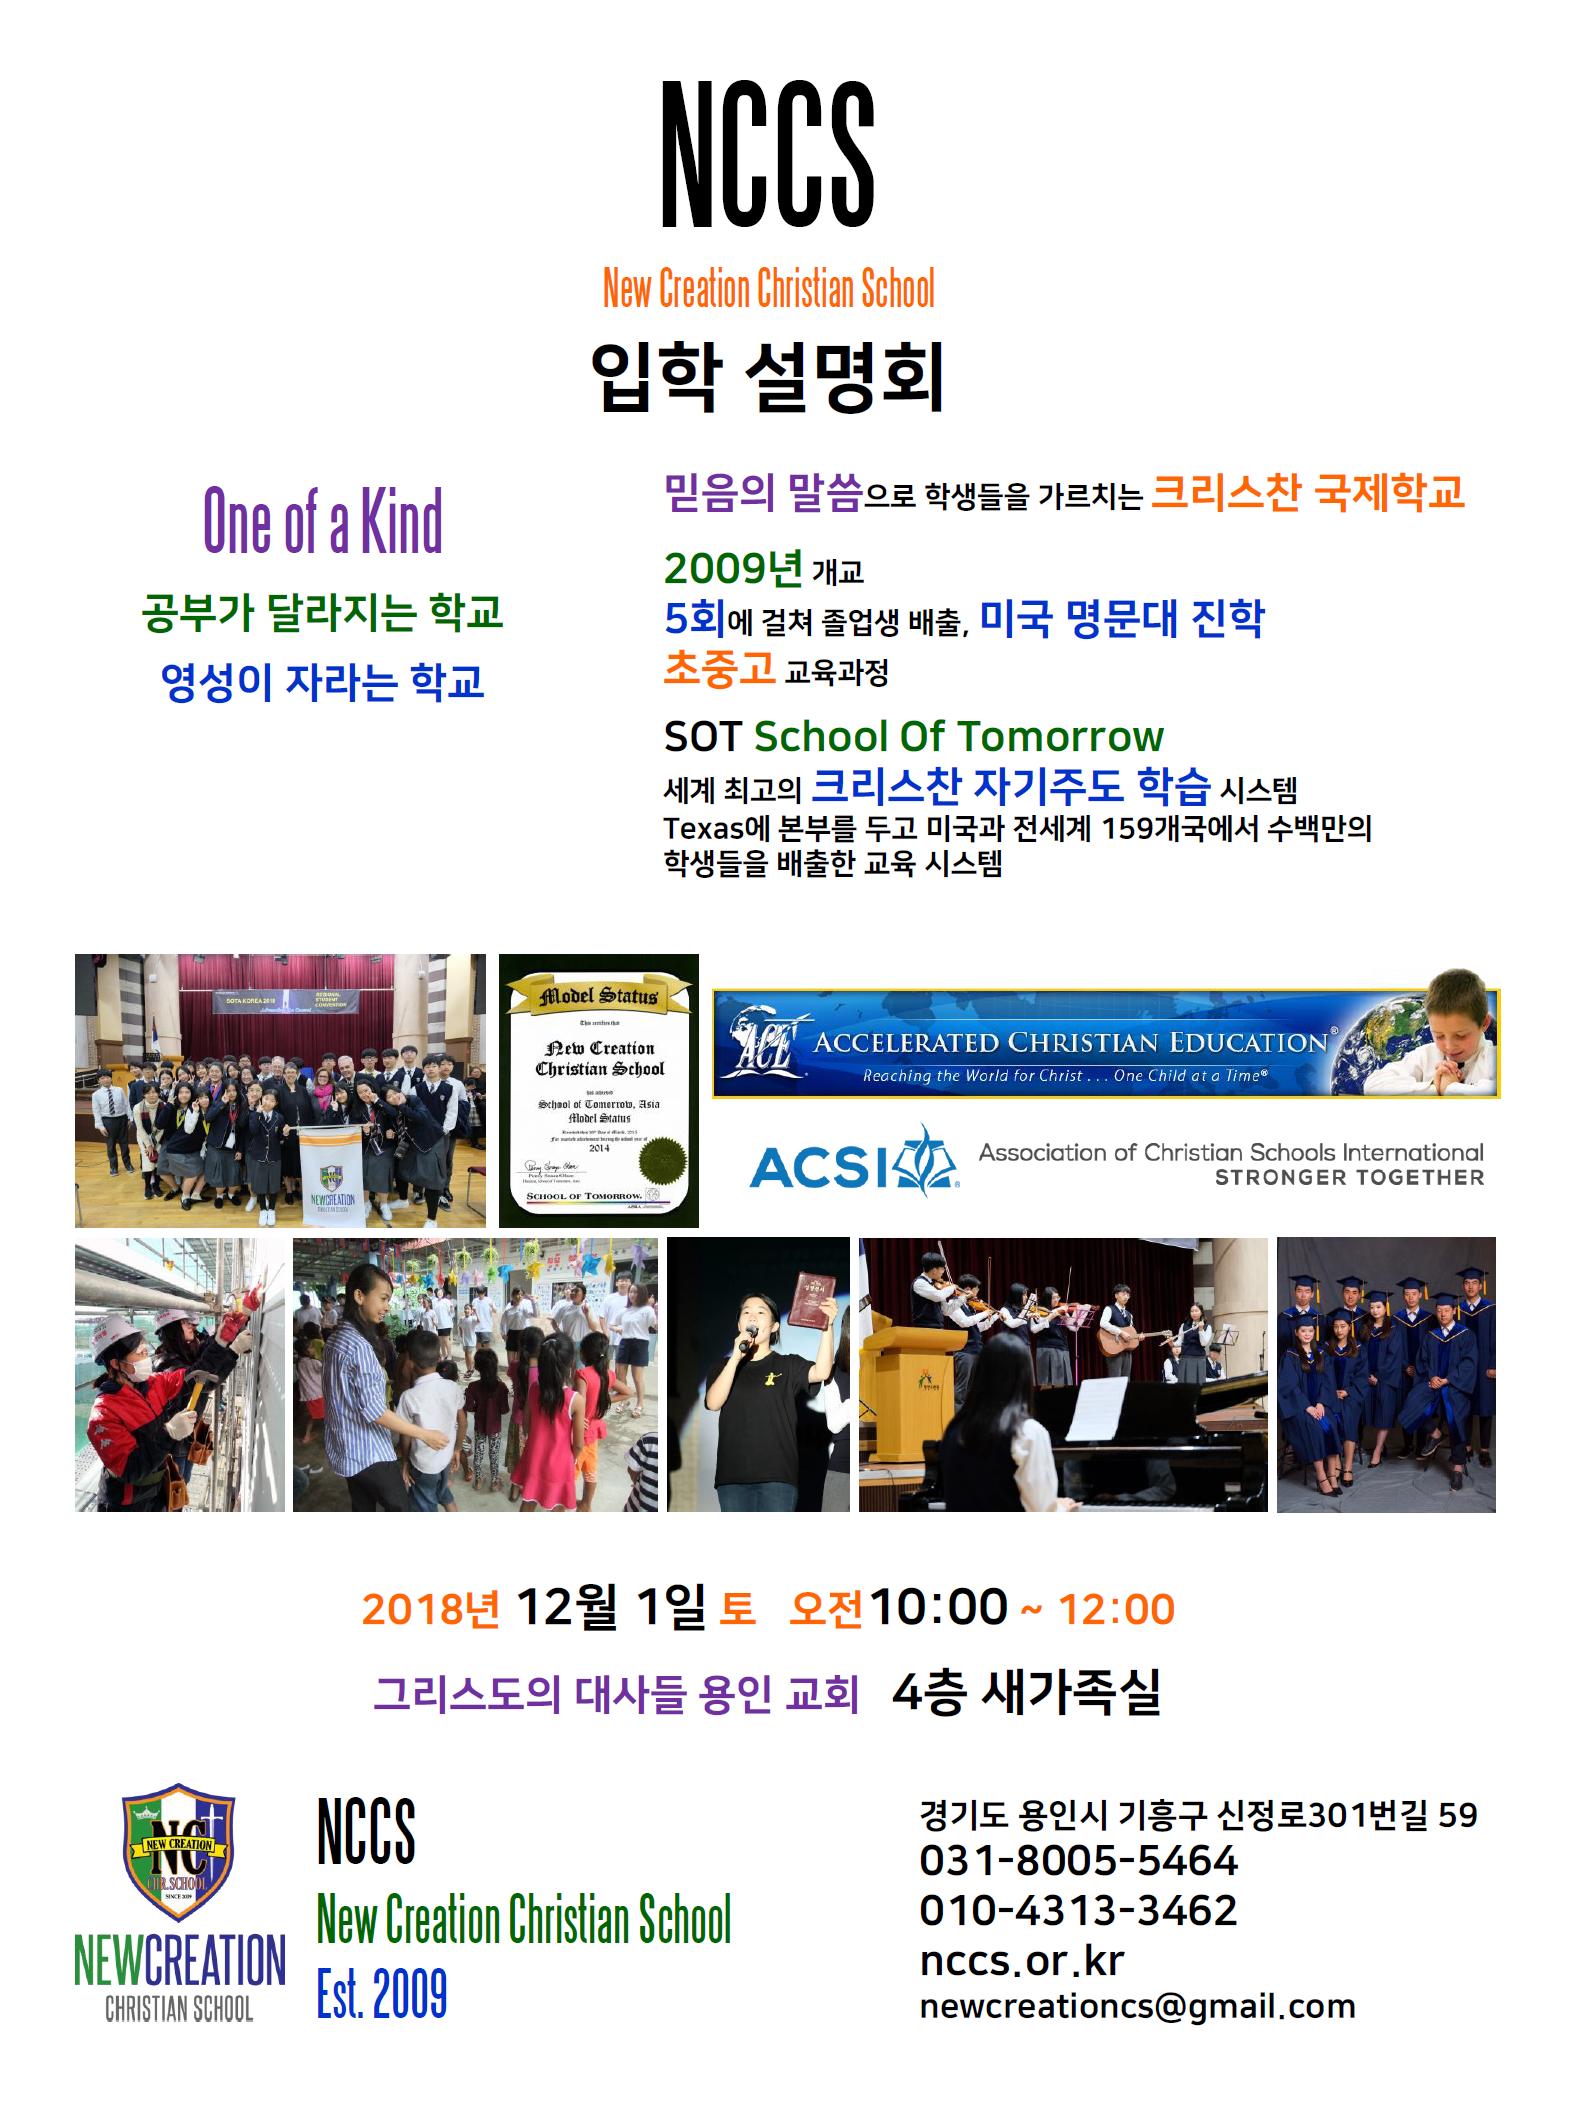 NCCS promotion event poster 2018